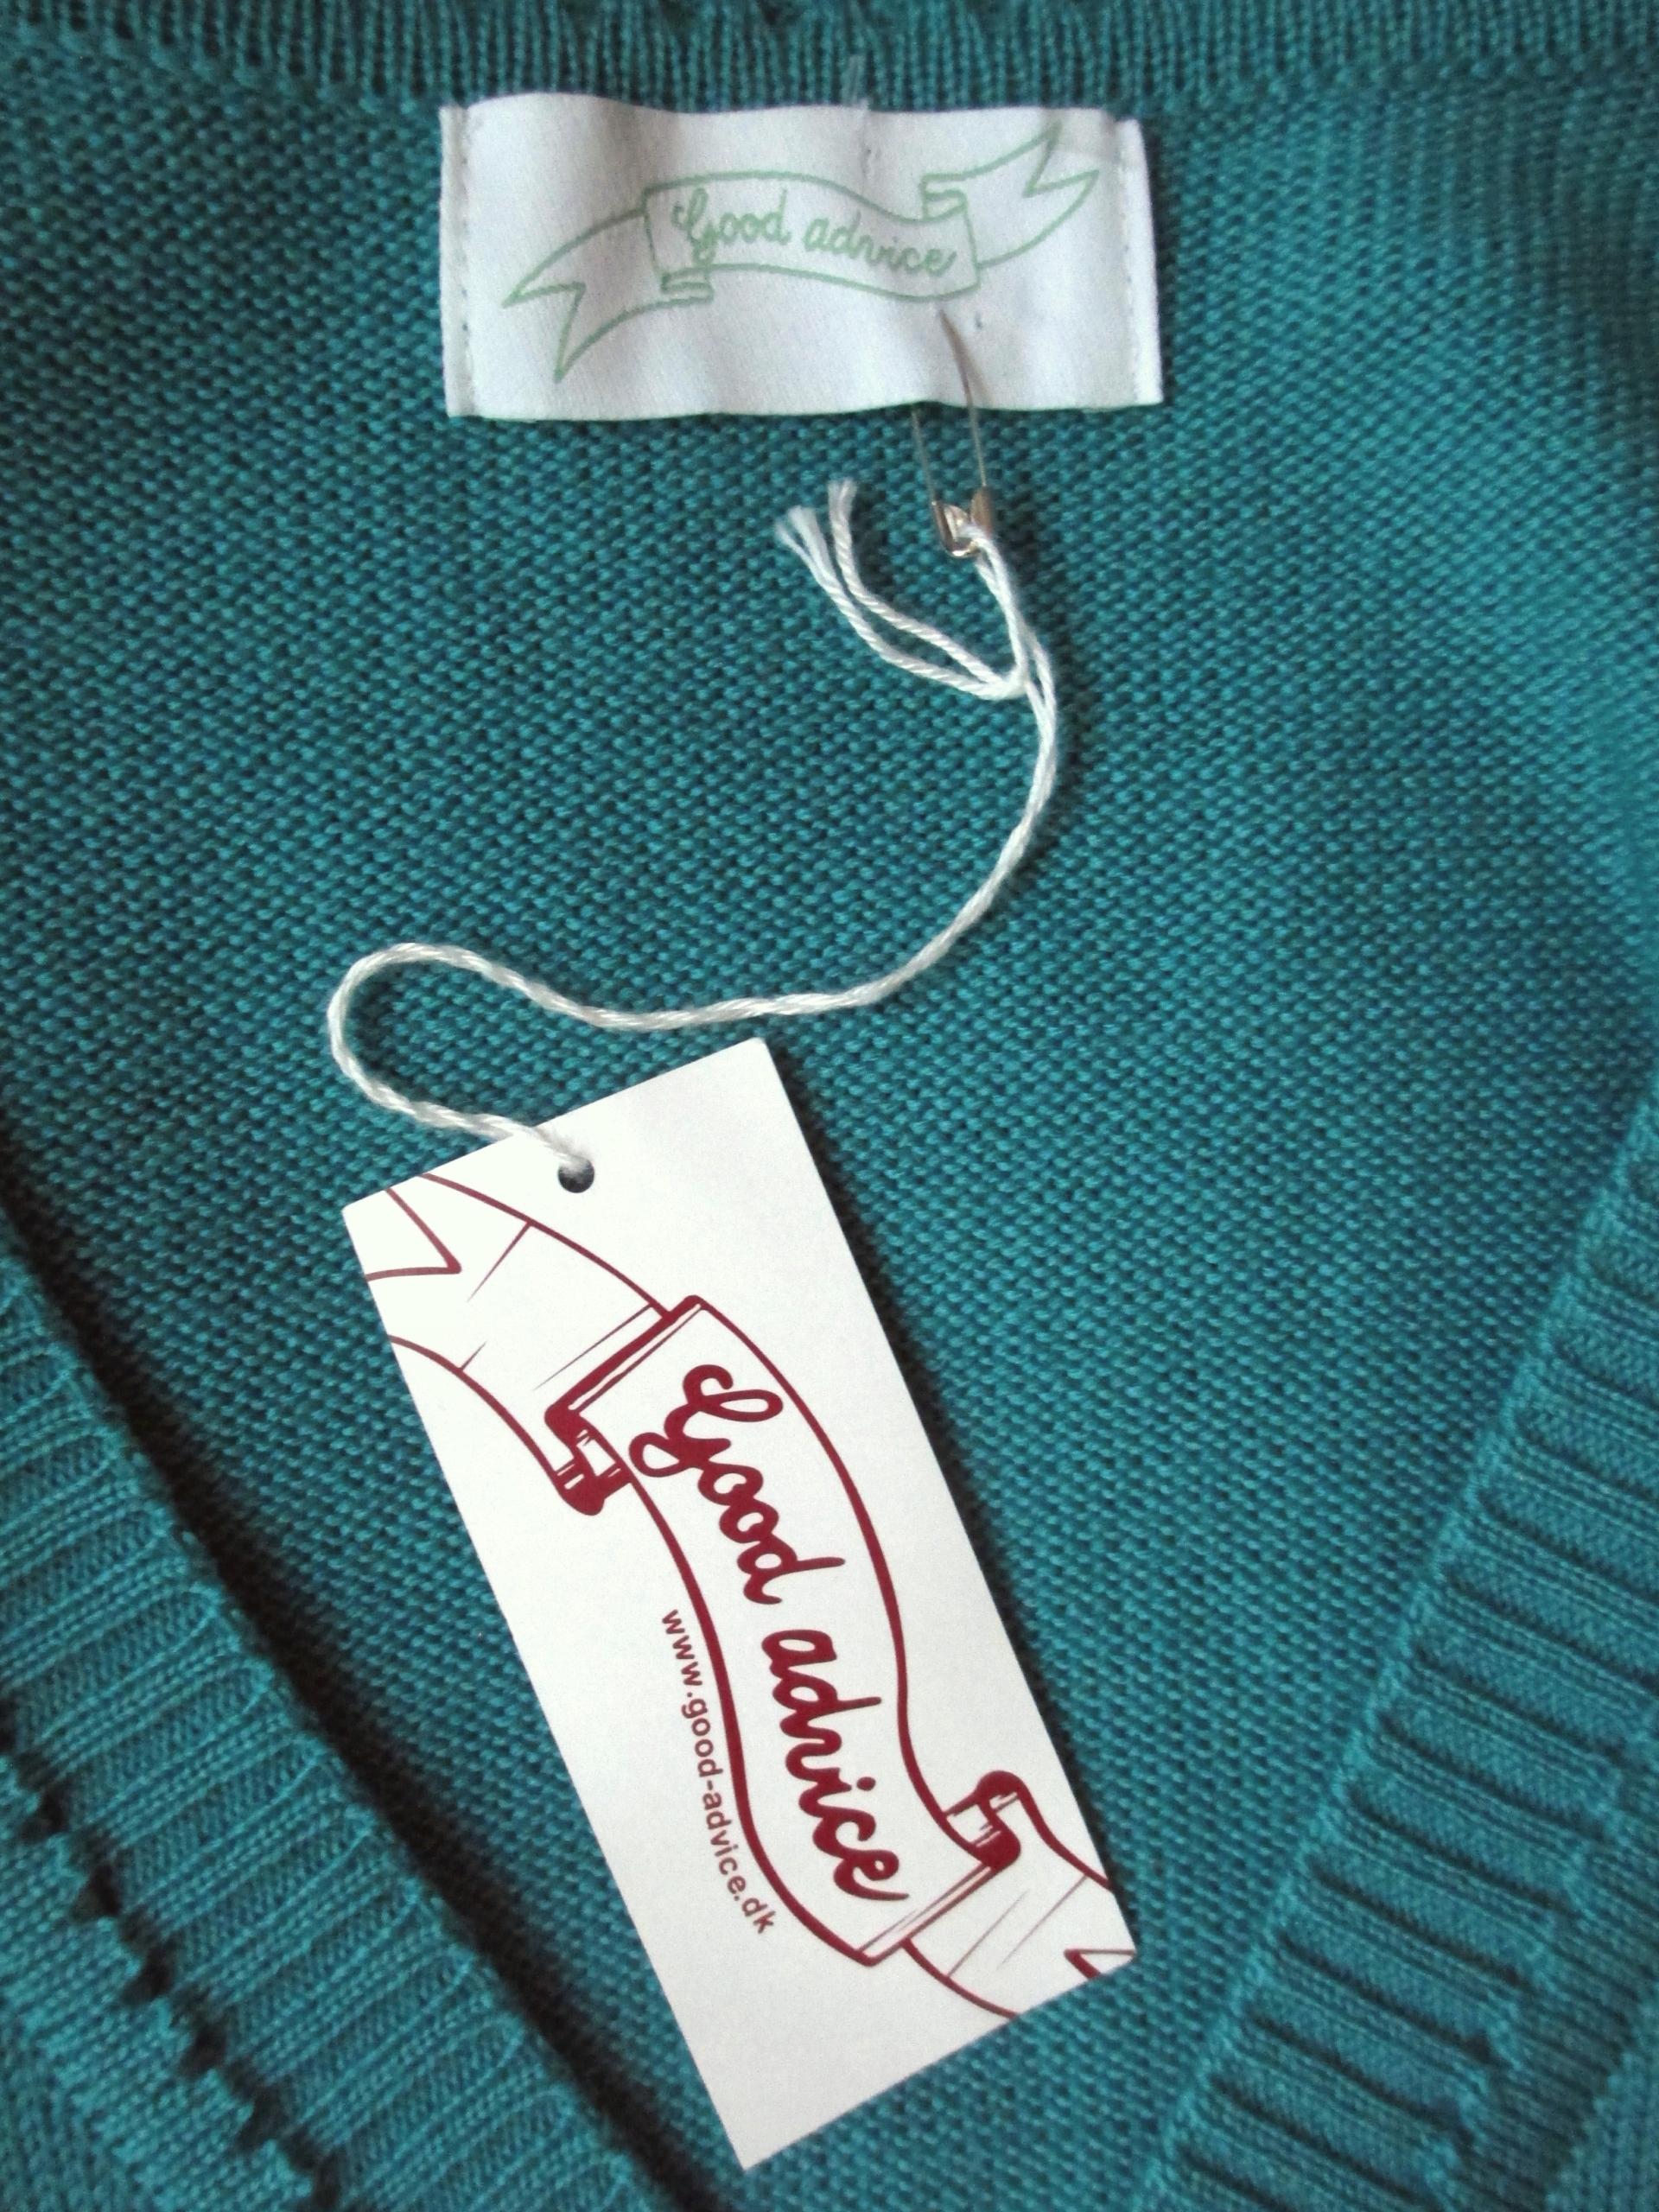 c0f660cdb0c5e5 GOOD ADVICE sweter turkusowy merino wool NOWY 36 - 7651247716 ...